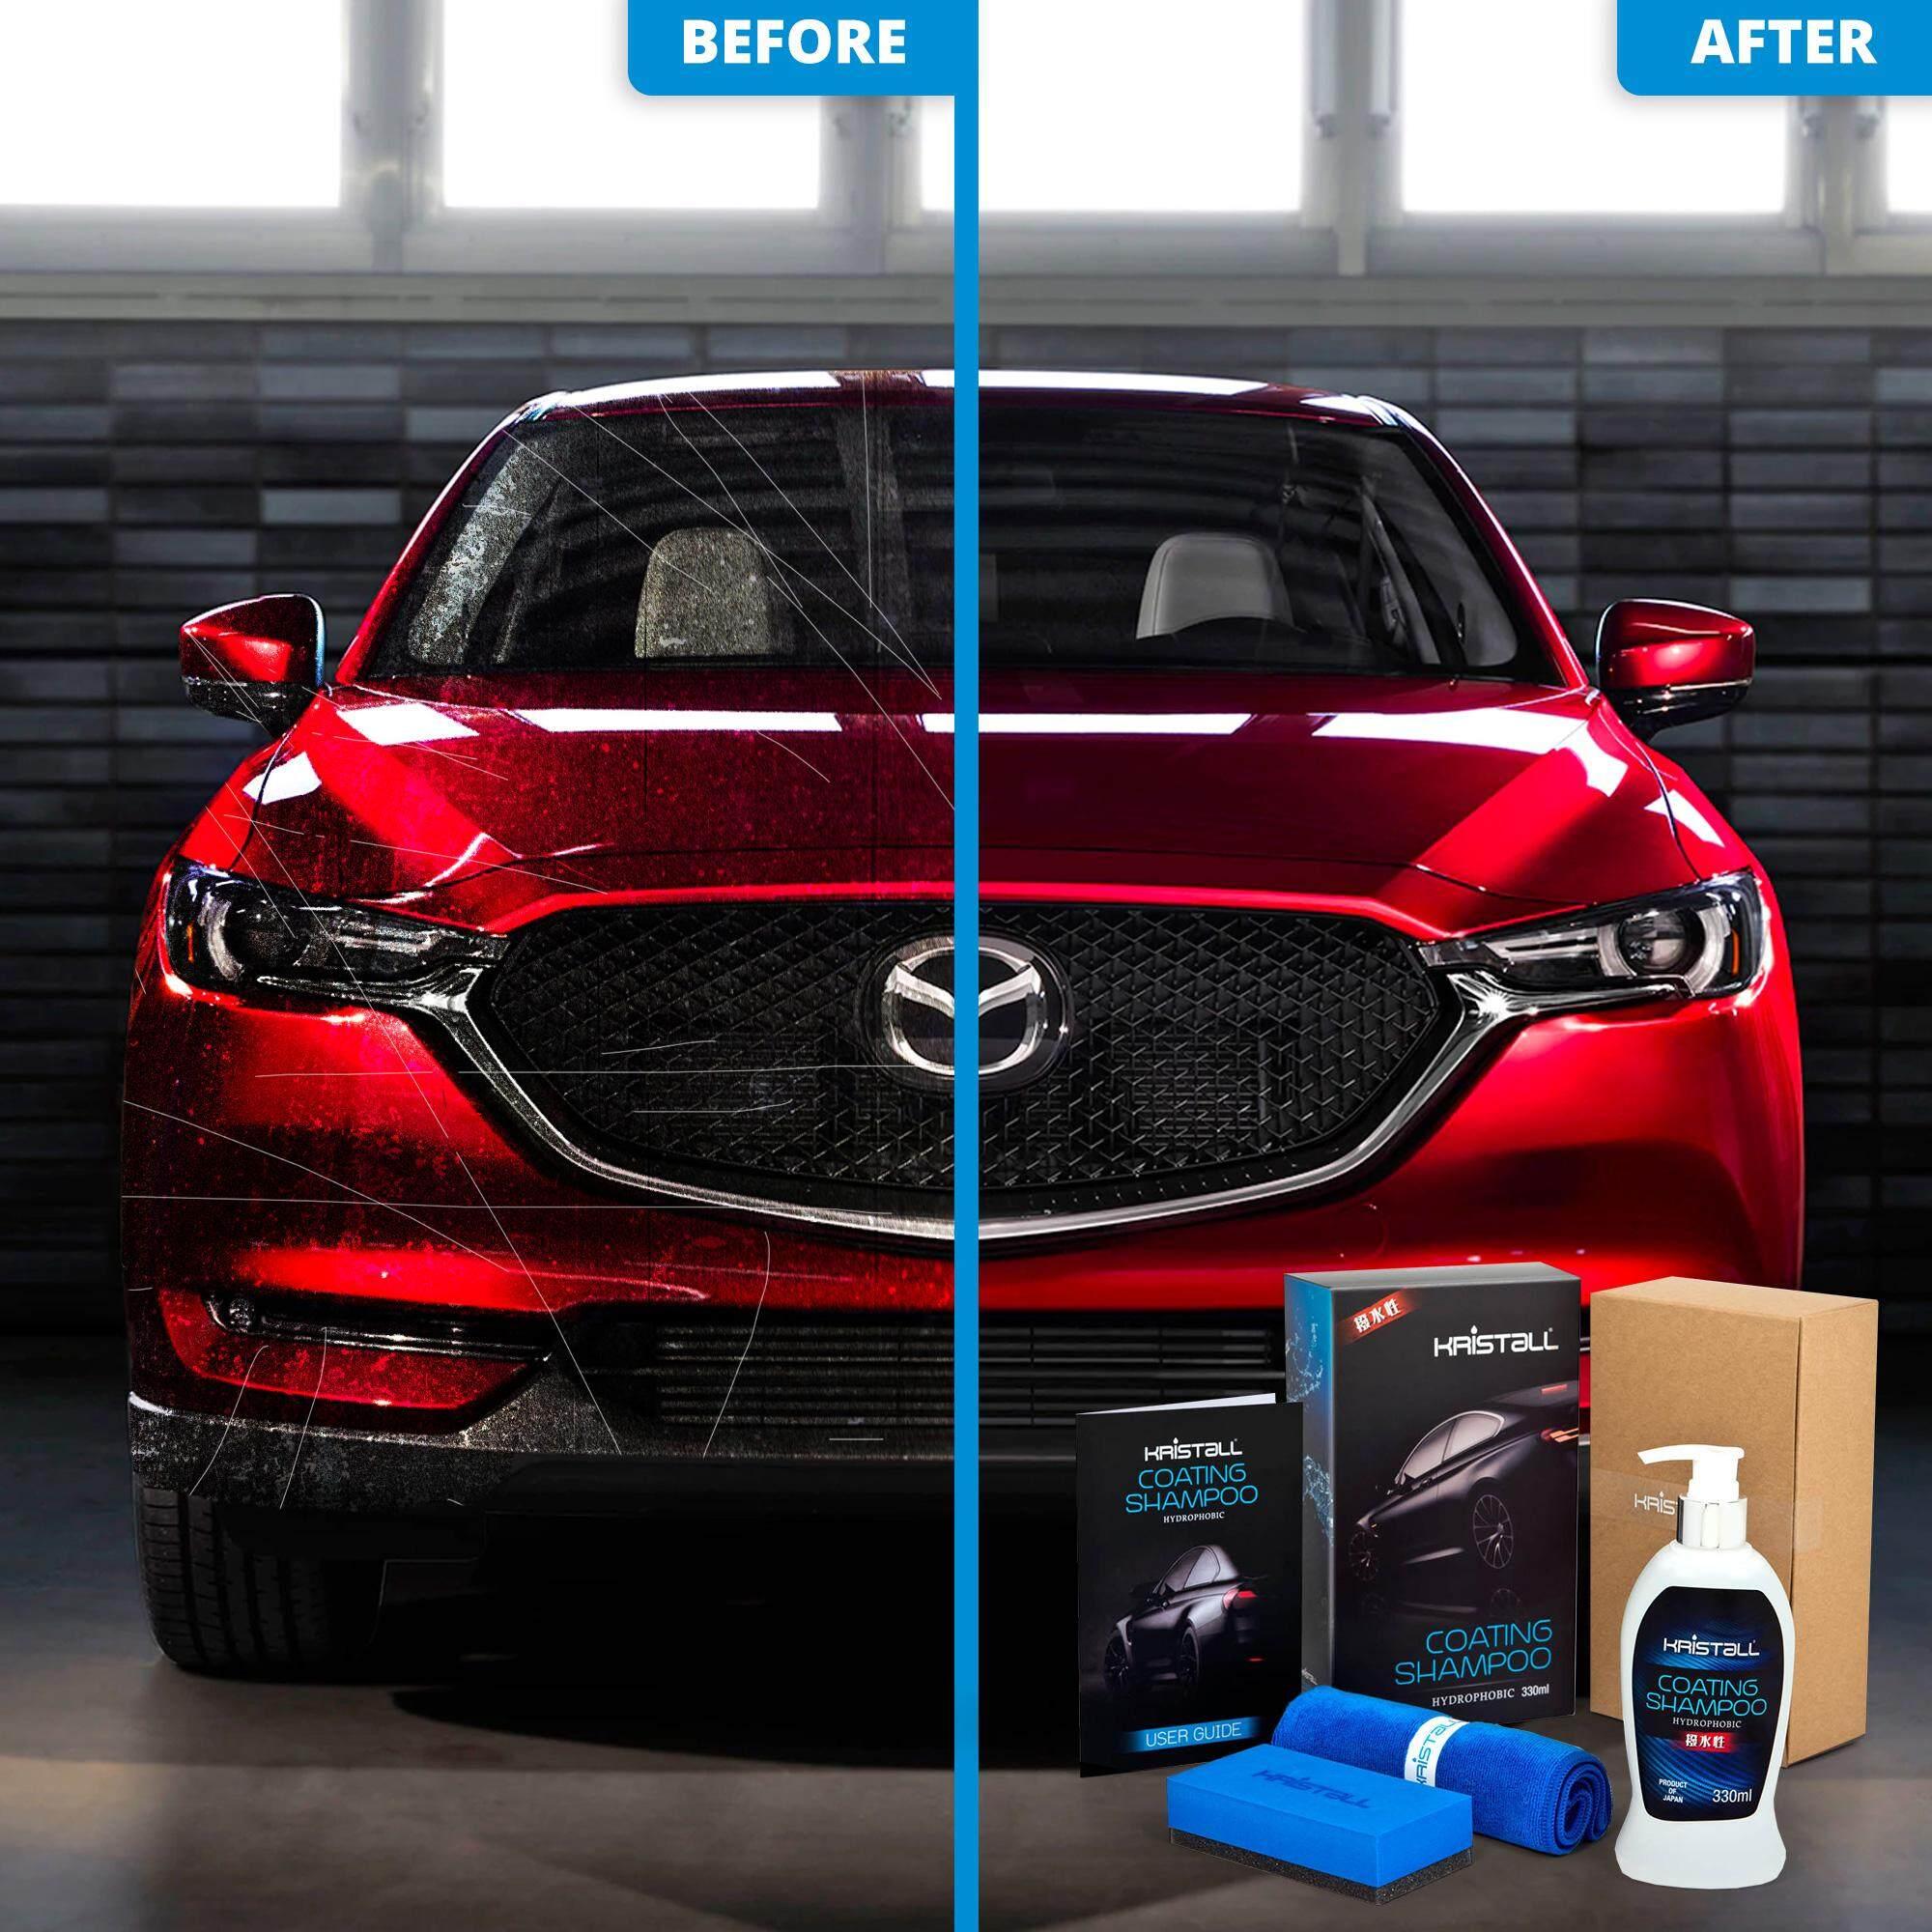 Mazda CX-5 Coating Shampoo - Kristall® Car Shampoo WITH Nano Coating (Car Paint Protection, Super Hydrophobic, Deep Gloss, 6.5 pH Balanced Neutral Shampoo)